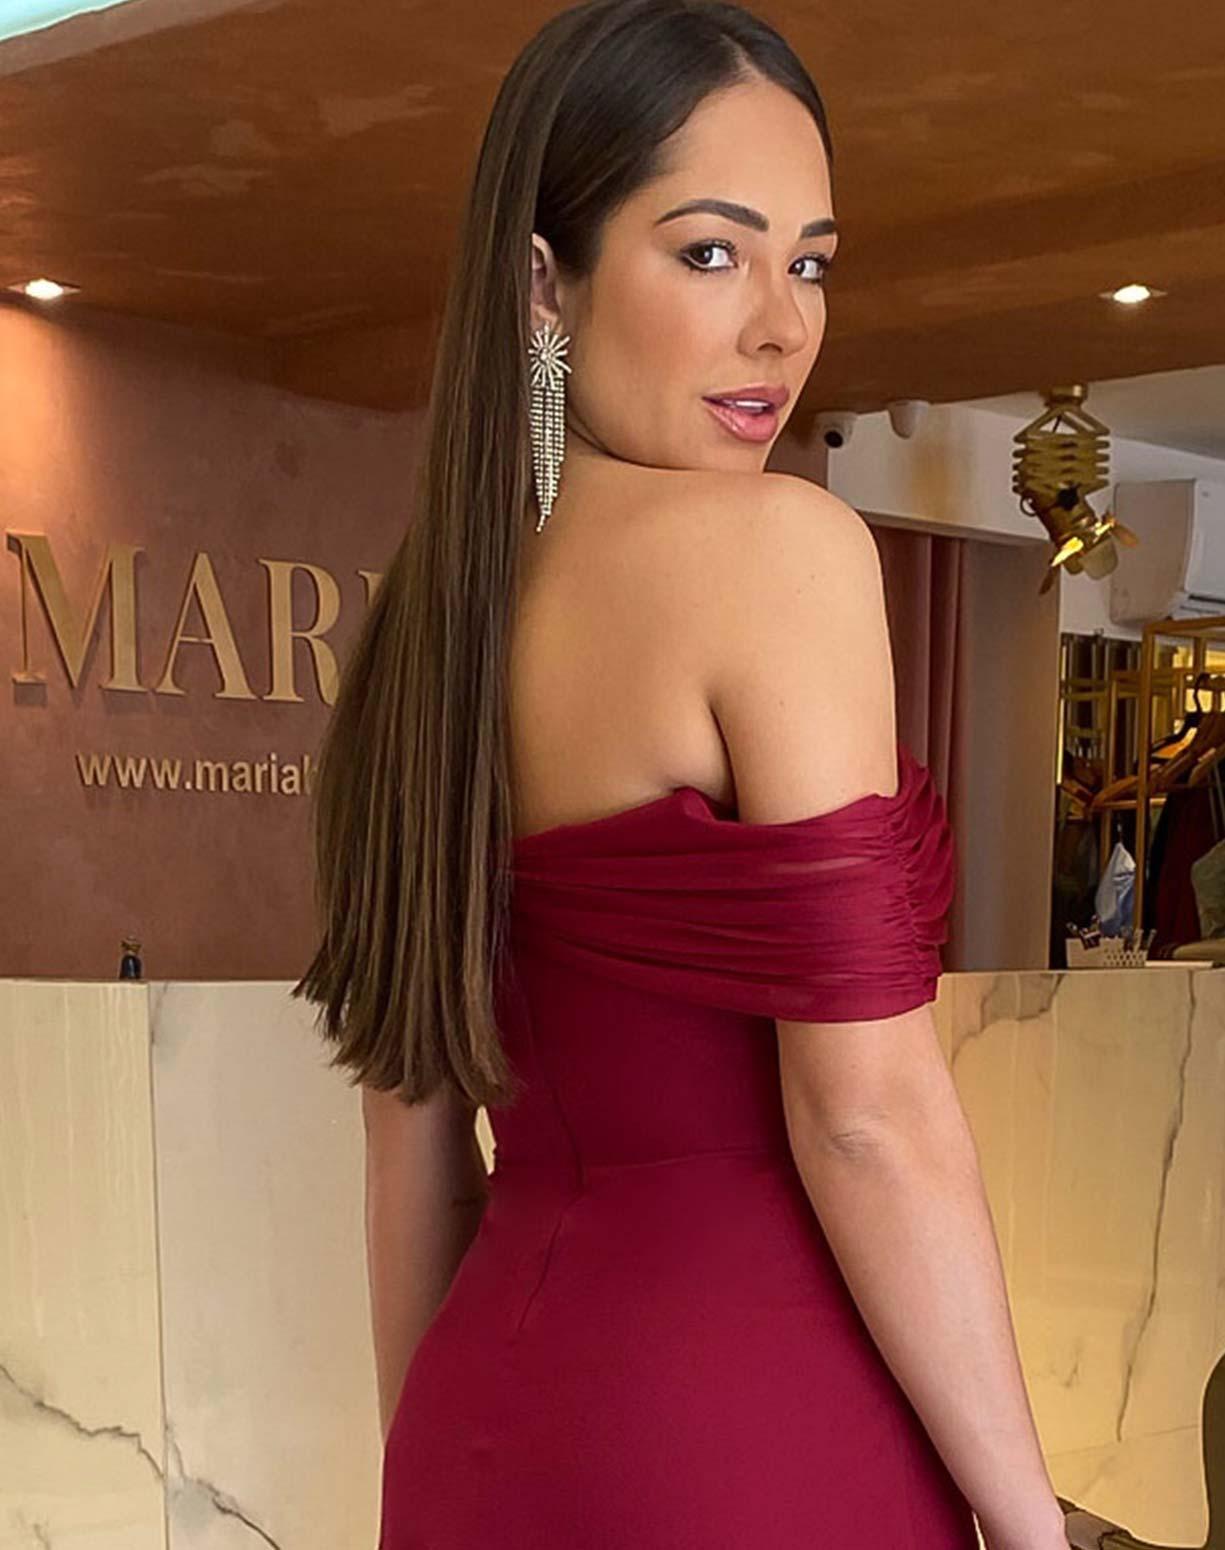 Vestido Marsala em Tule com Decote Ombro a Ombro